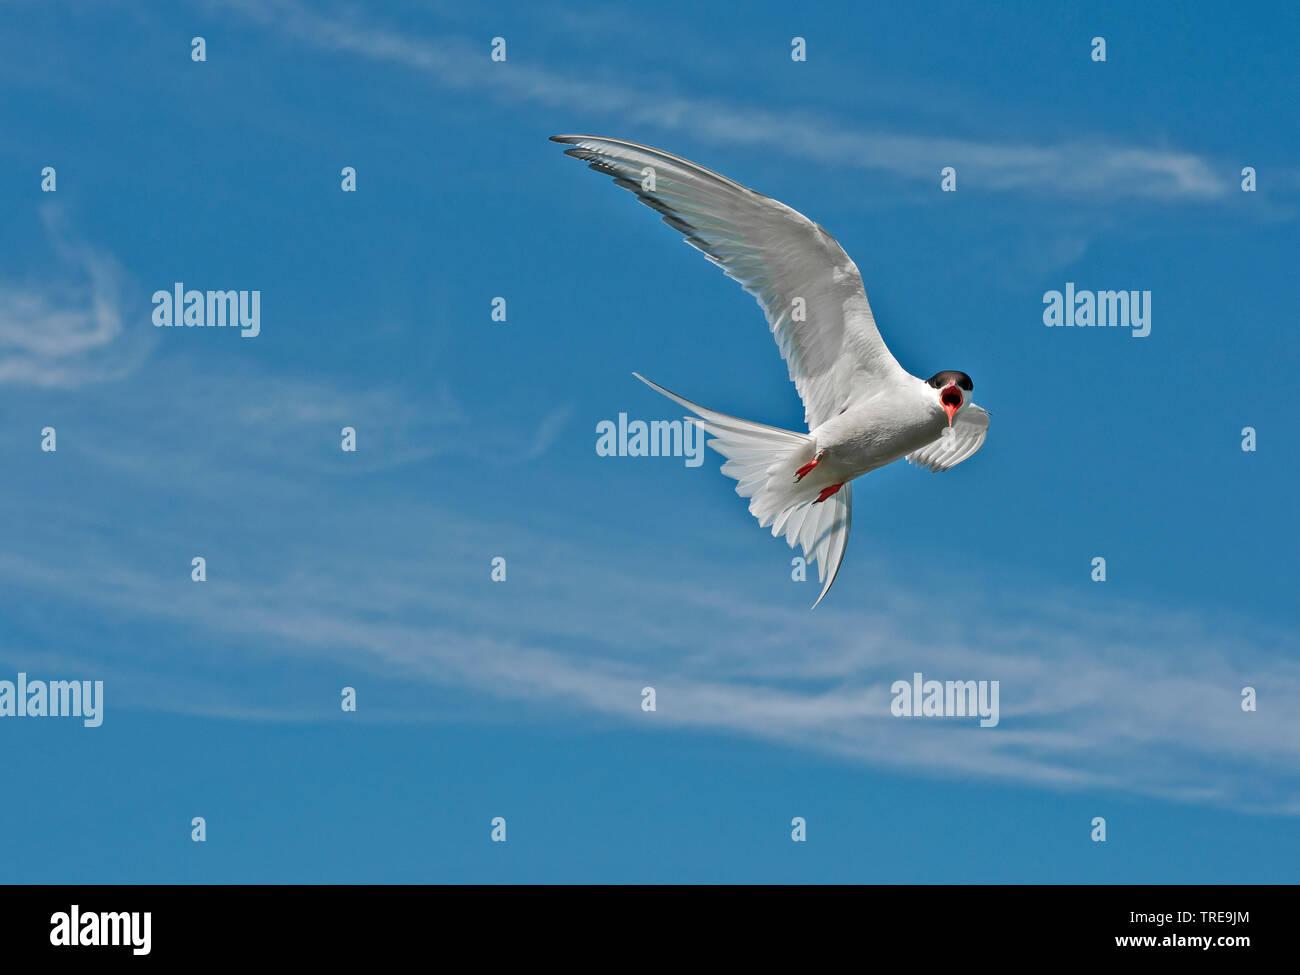 Kuestenseeschwalbe, Kuesten-Seeschwalbe (Sterna paradisaea), im Flug, rufend, Niederlande | arctic tern (Sterna paradisaea), in flight, calling, Nethe - Stock Image